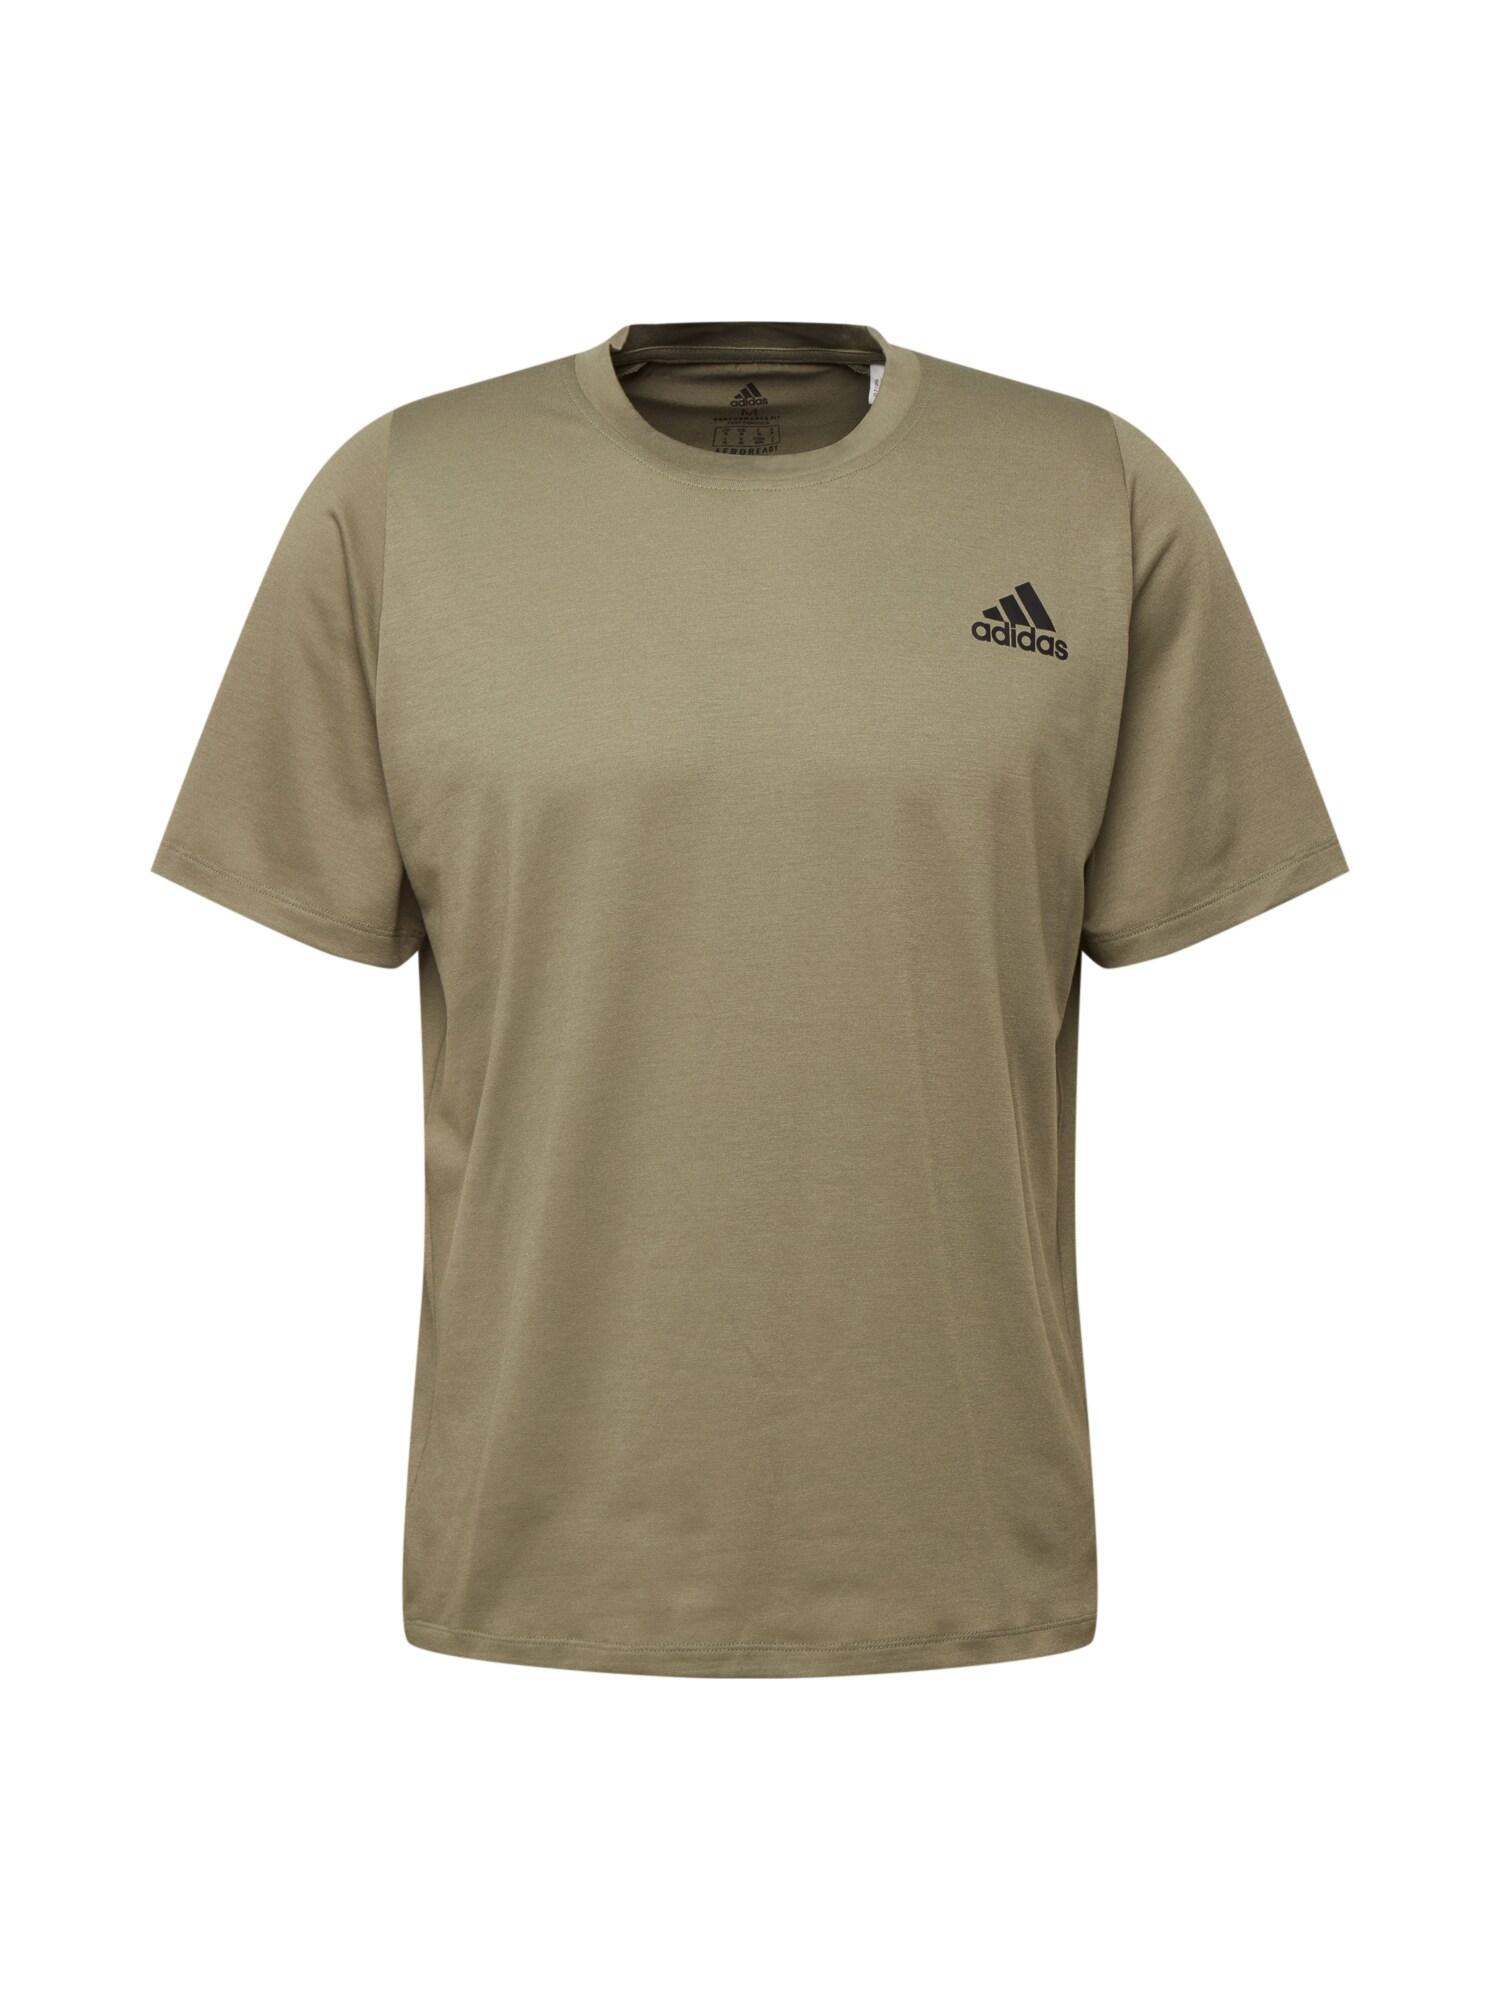 ADIDAS PERFORMANCE Funkční tričko  barvy bláta / černá